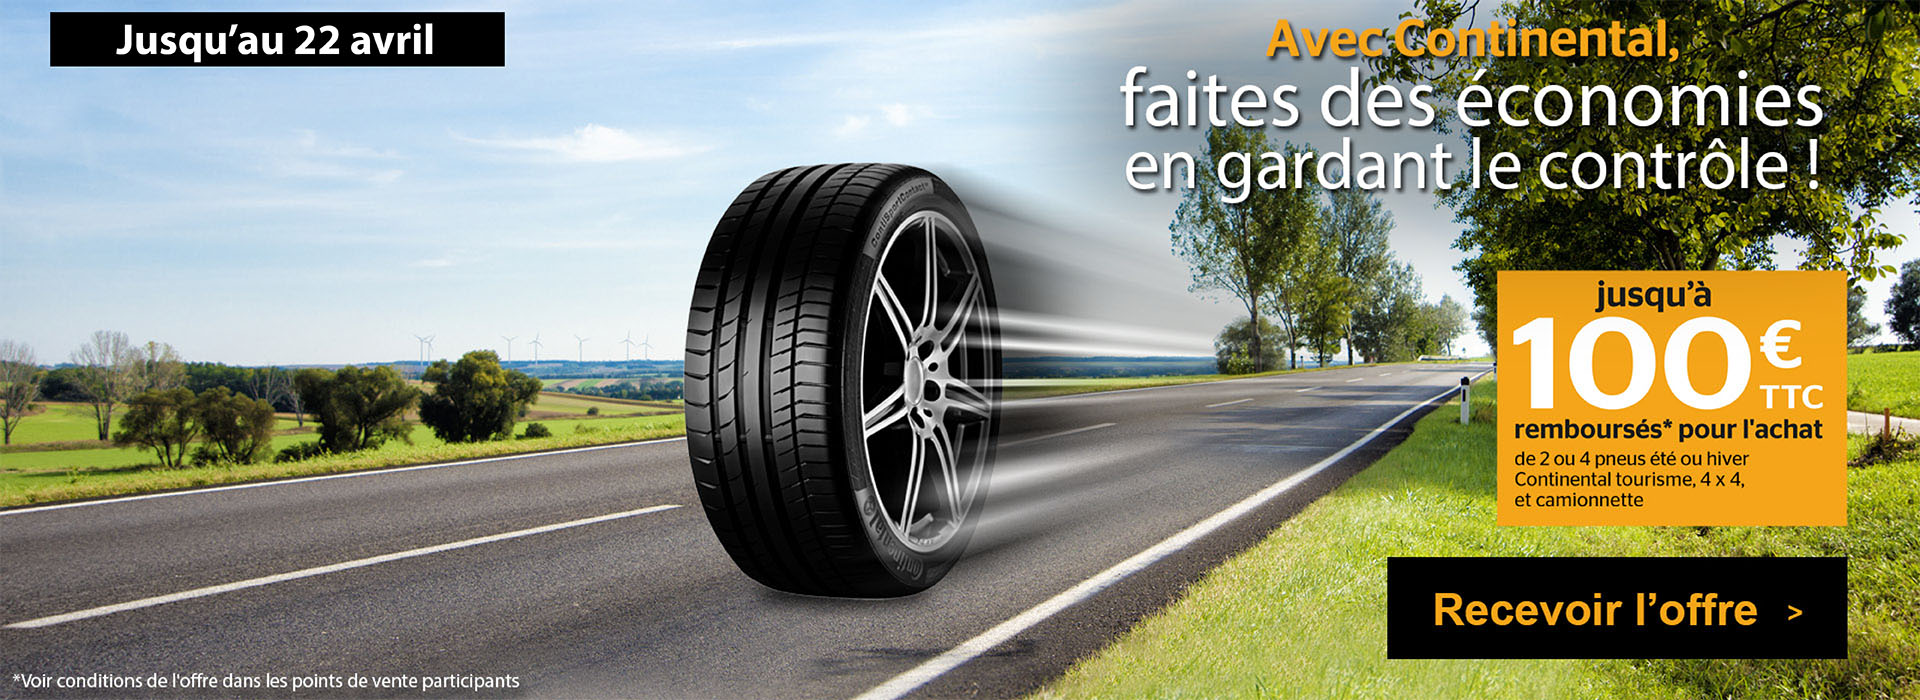 Volvo metz vente voiture neuve vehicule occasion for Garage vente voiture occasion metz